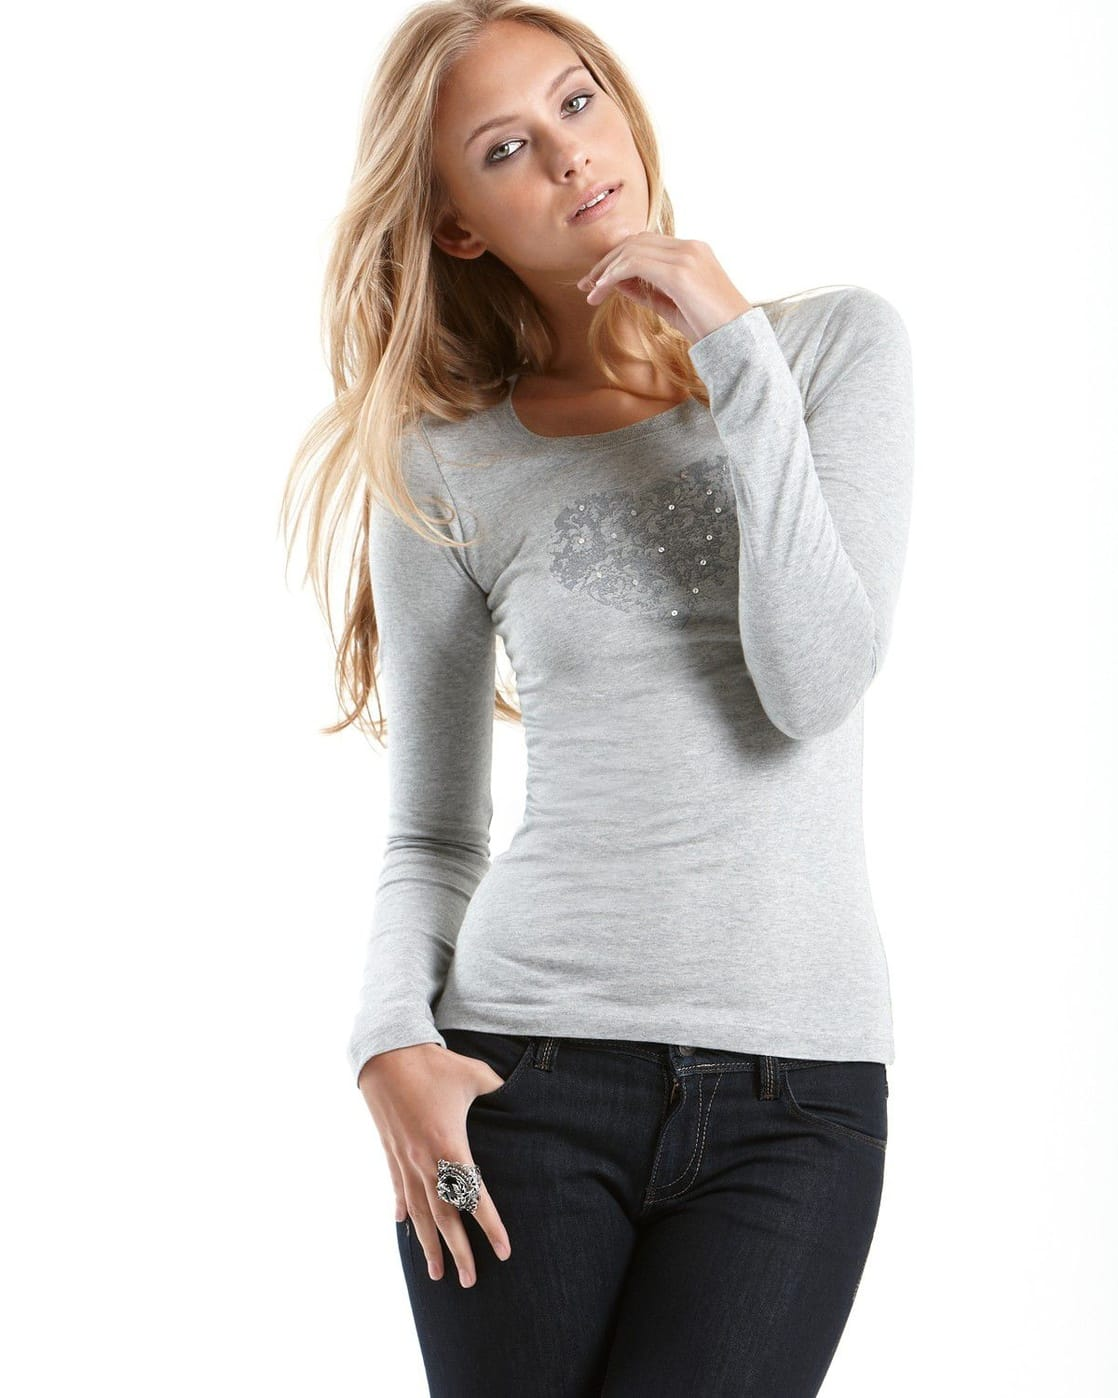 Forum on this topic: Gabrielle Marion-Rivard, zuzanna-krzatala/